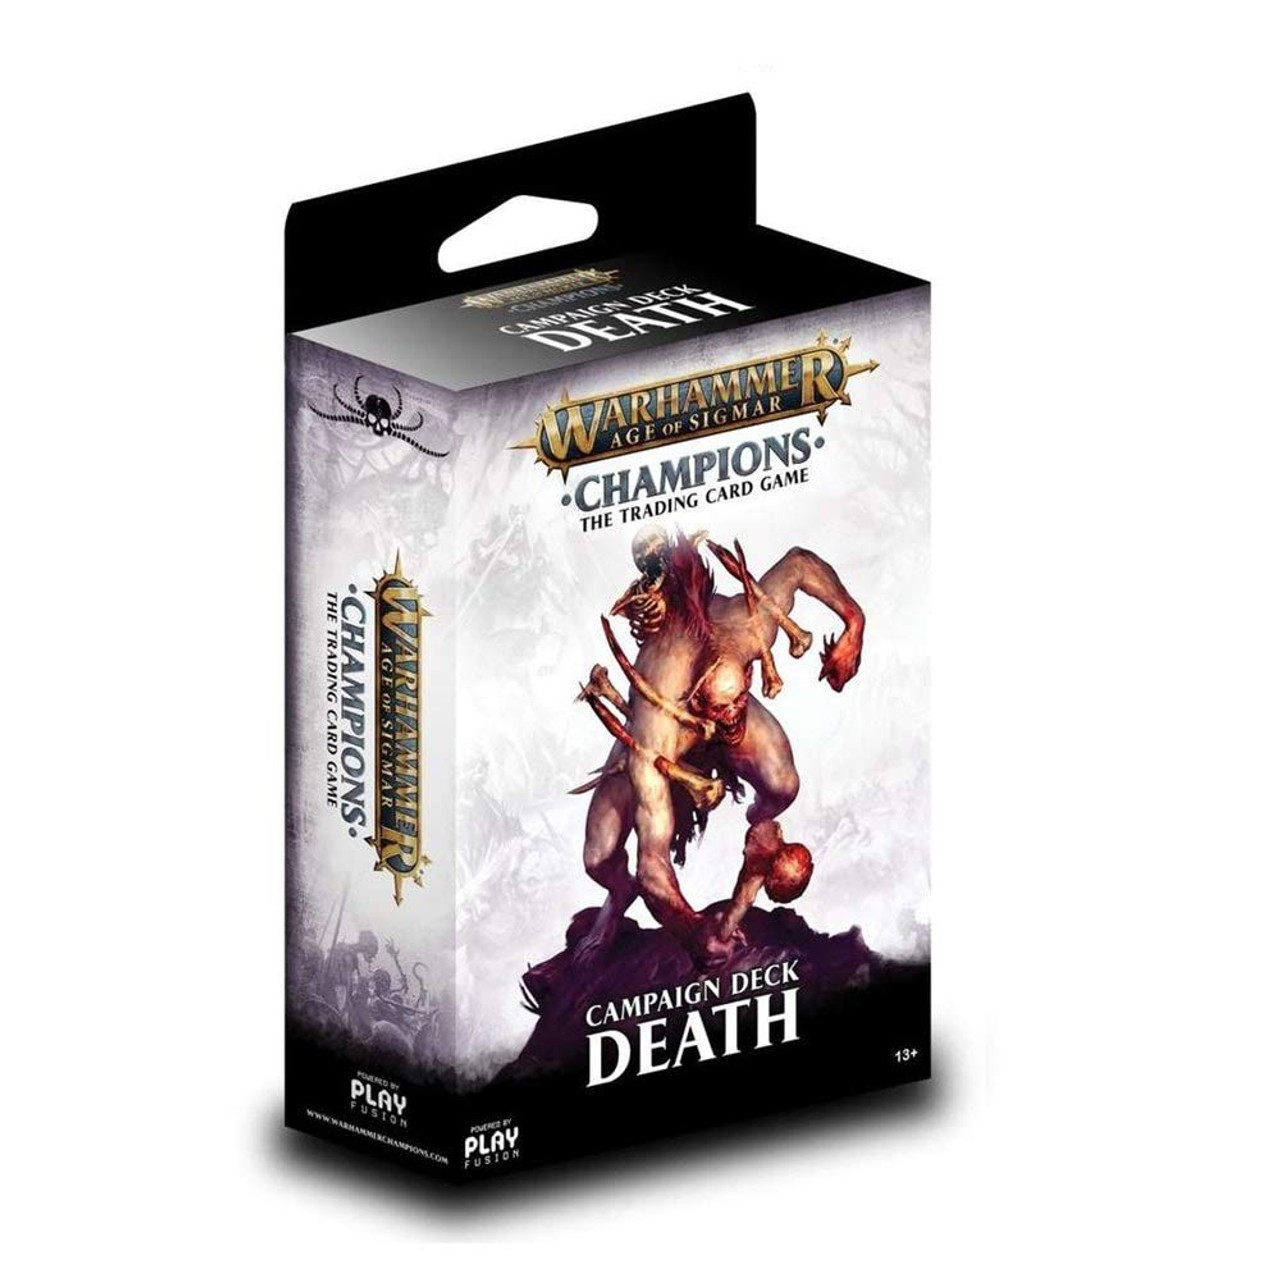 Warhammer Age of Sigmar Champions TCG - DEATH Campaign Deck